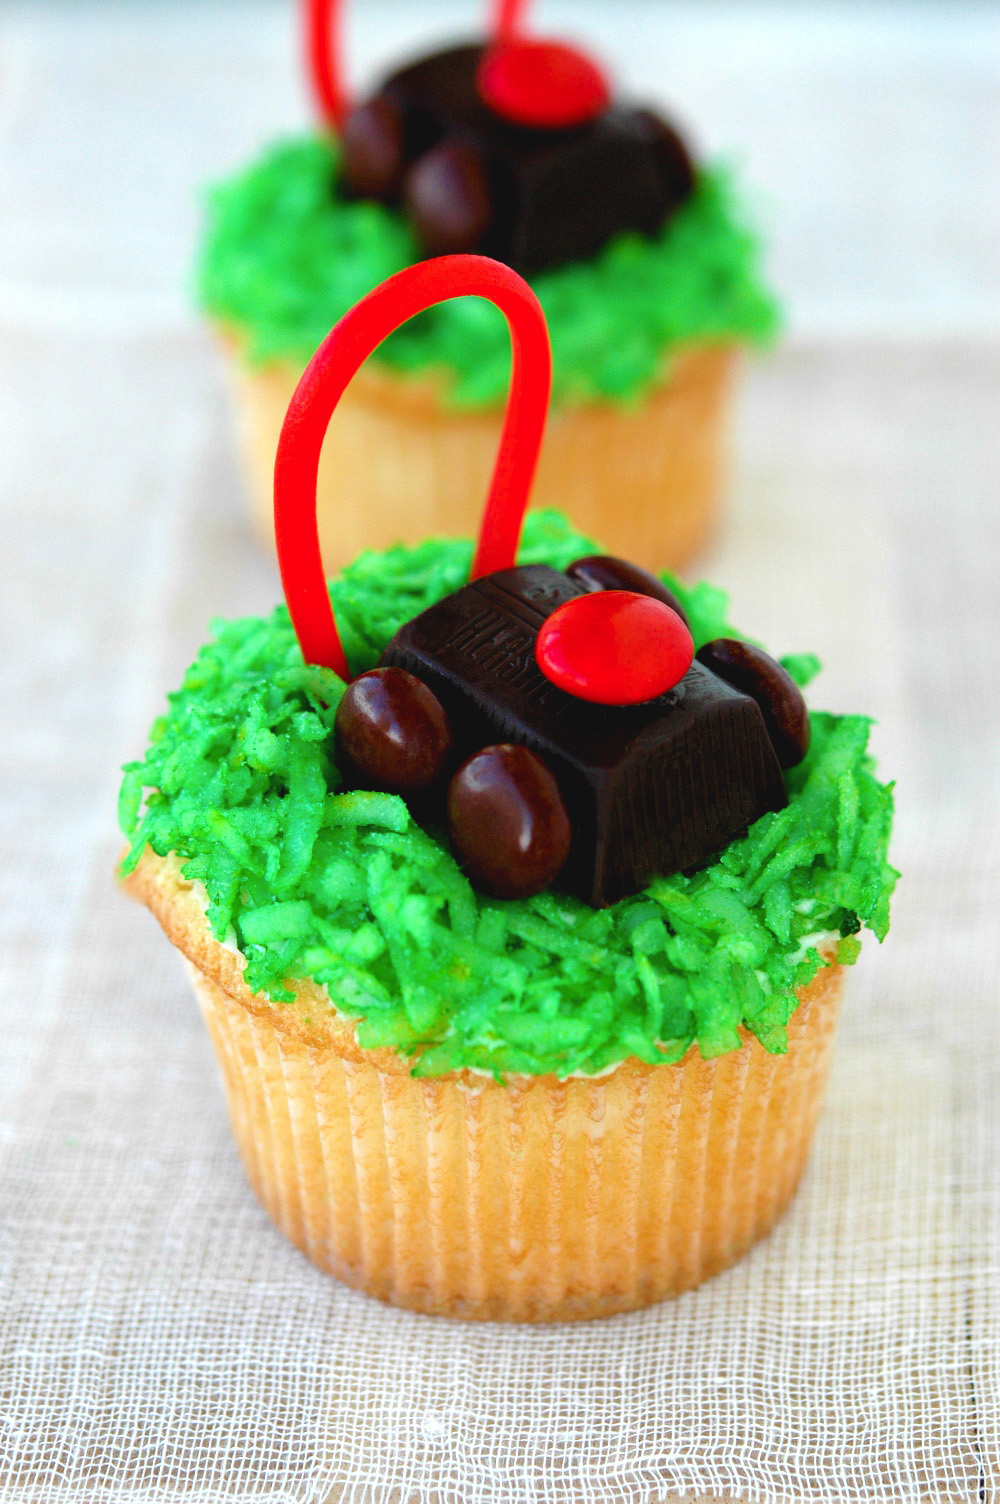 lawnmower-cupcake